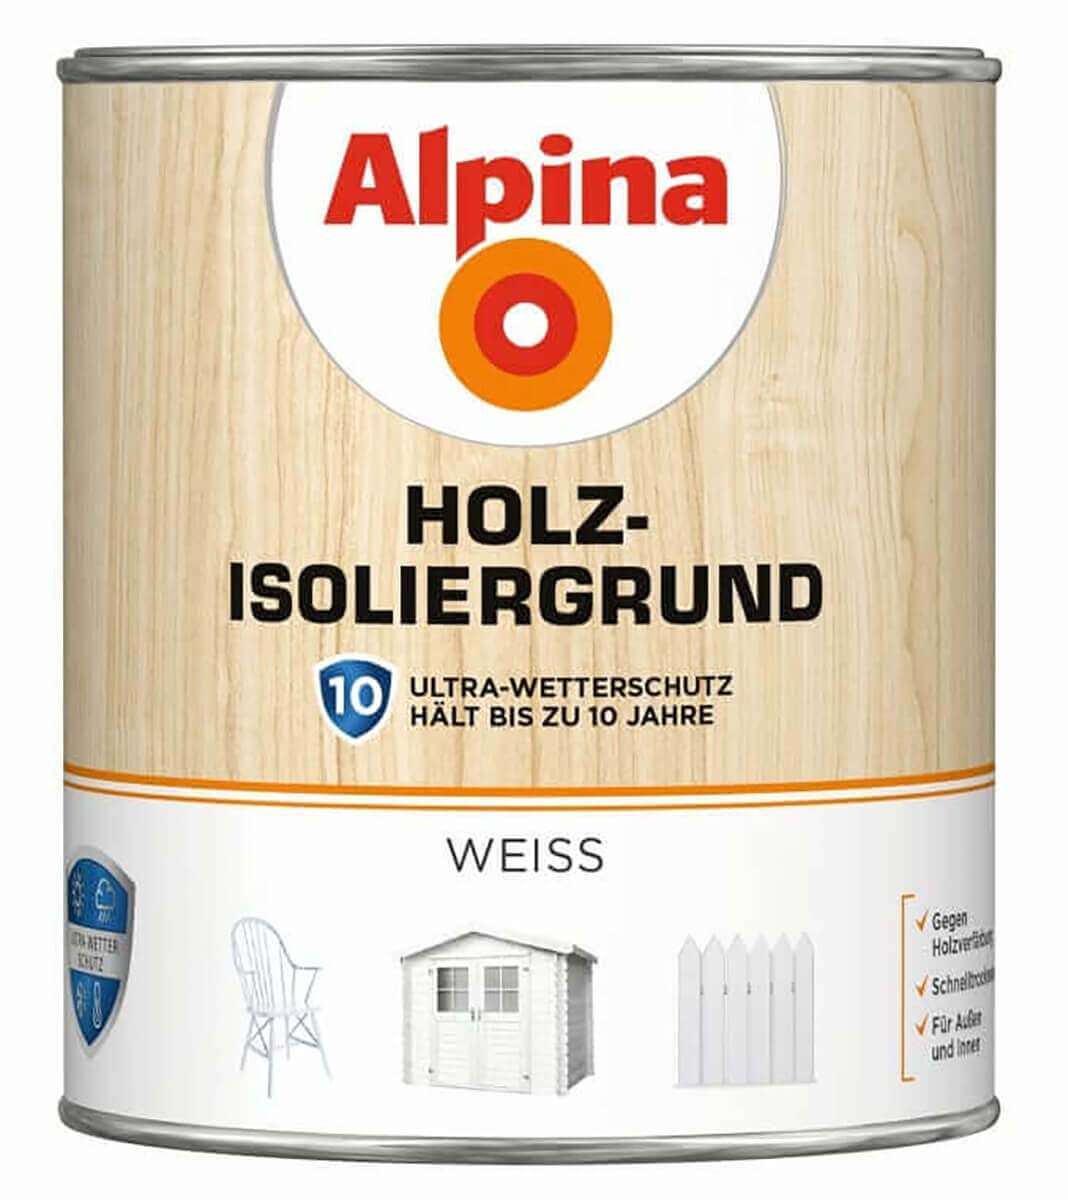 alpina holz isoliergrund